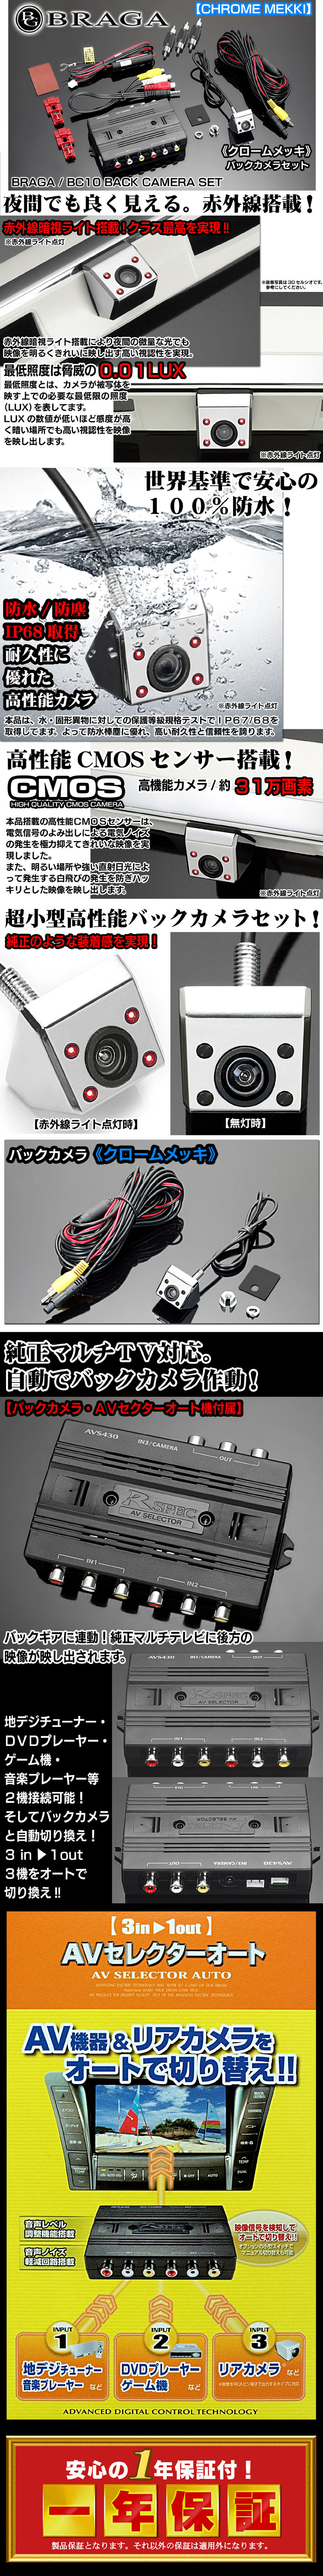 BC10バックカメラセット《ブラック》赤外線ライト搭載/12V専用